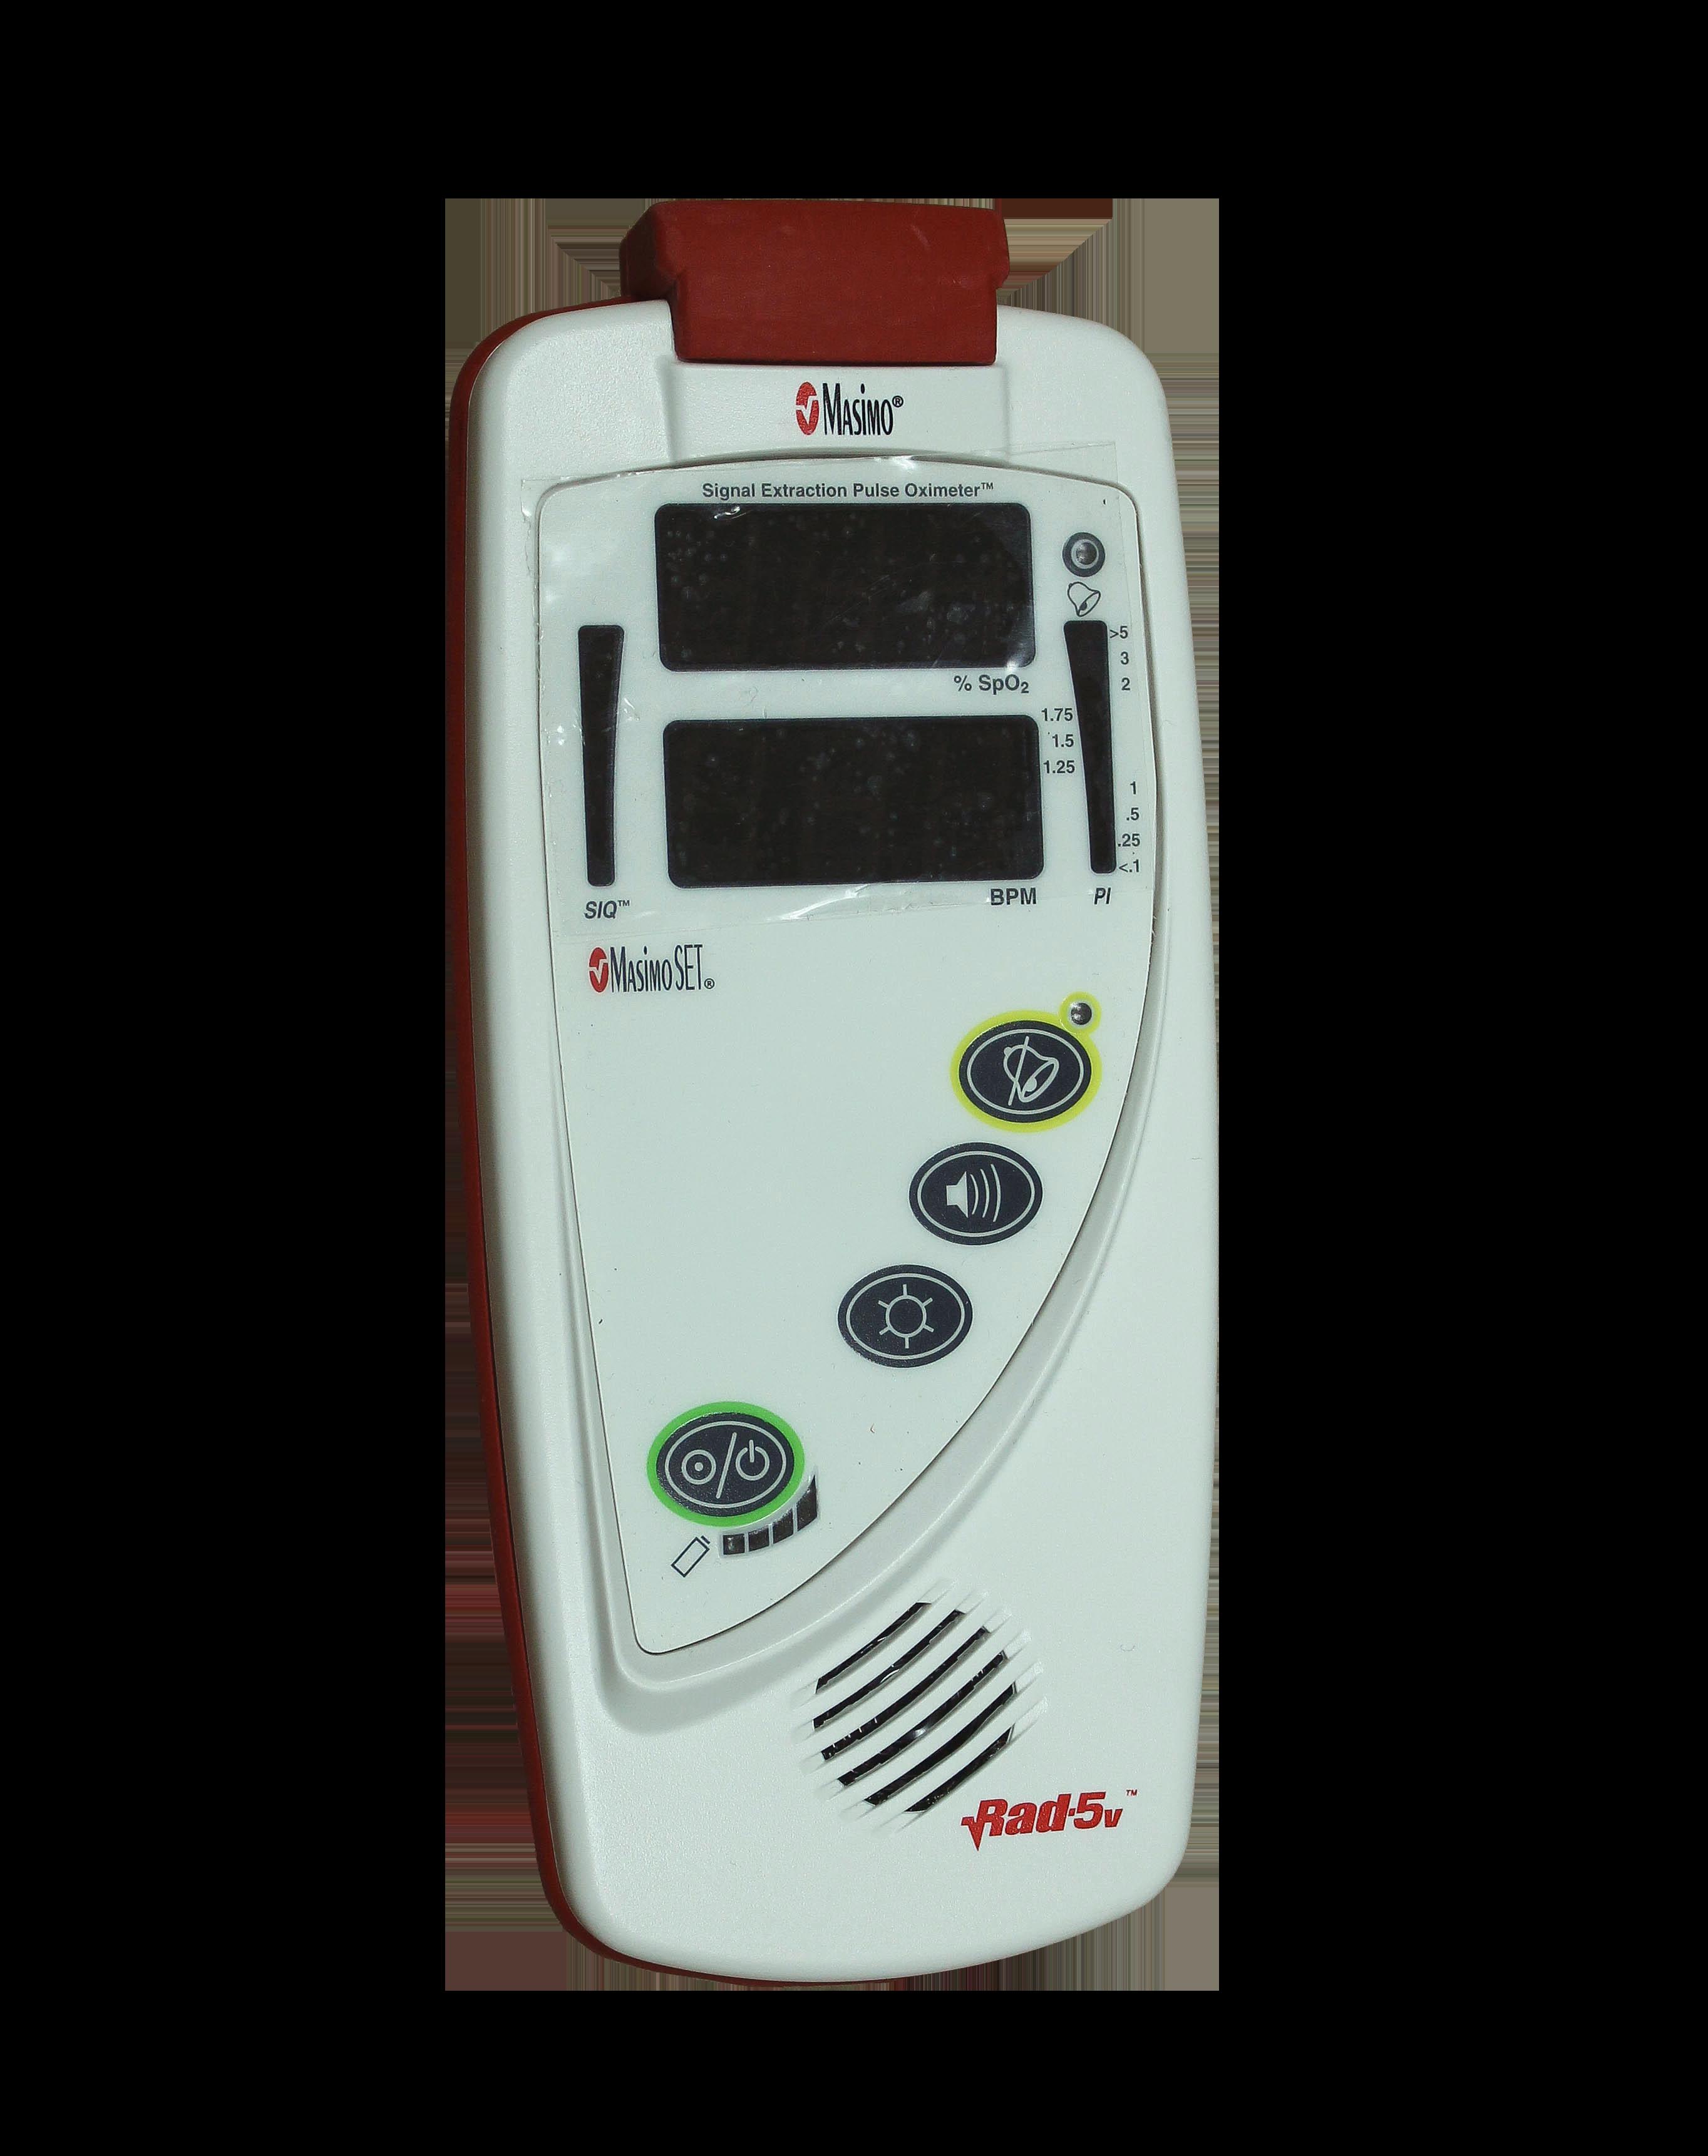 Masimo Rad-5v Pulse Oximeter